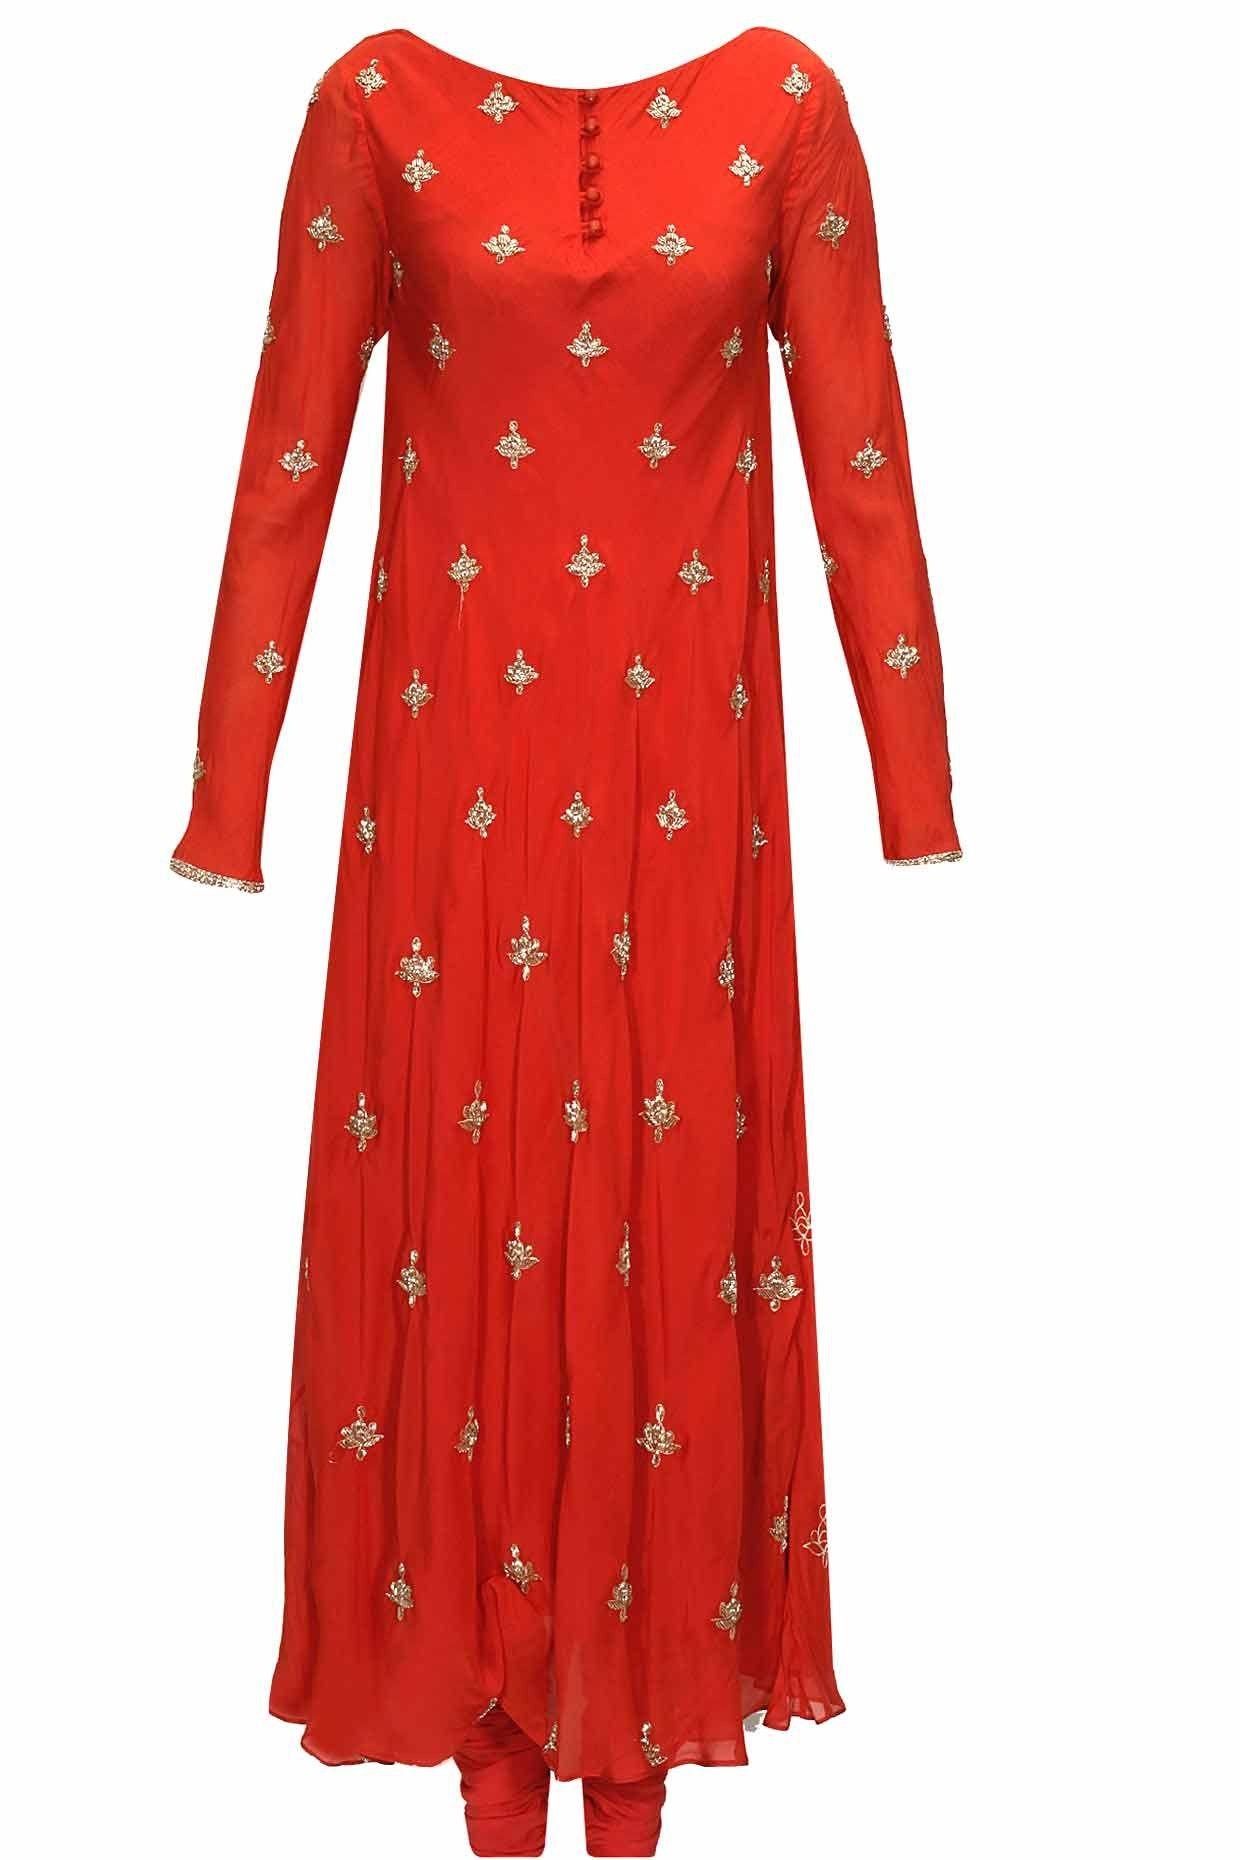 Zoraya salwars pinterest red gold designer jewelry and